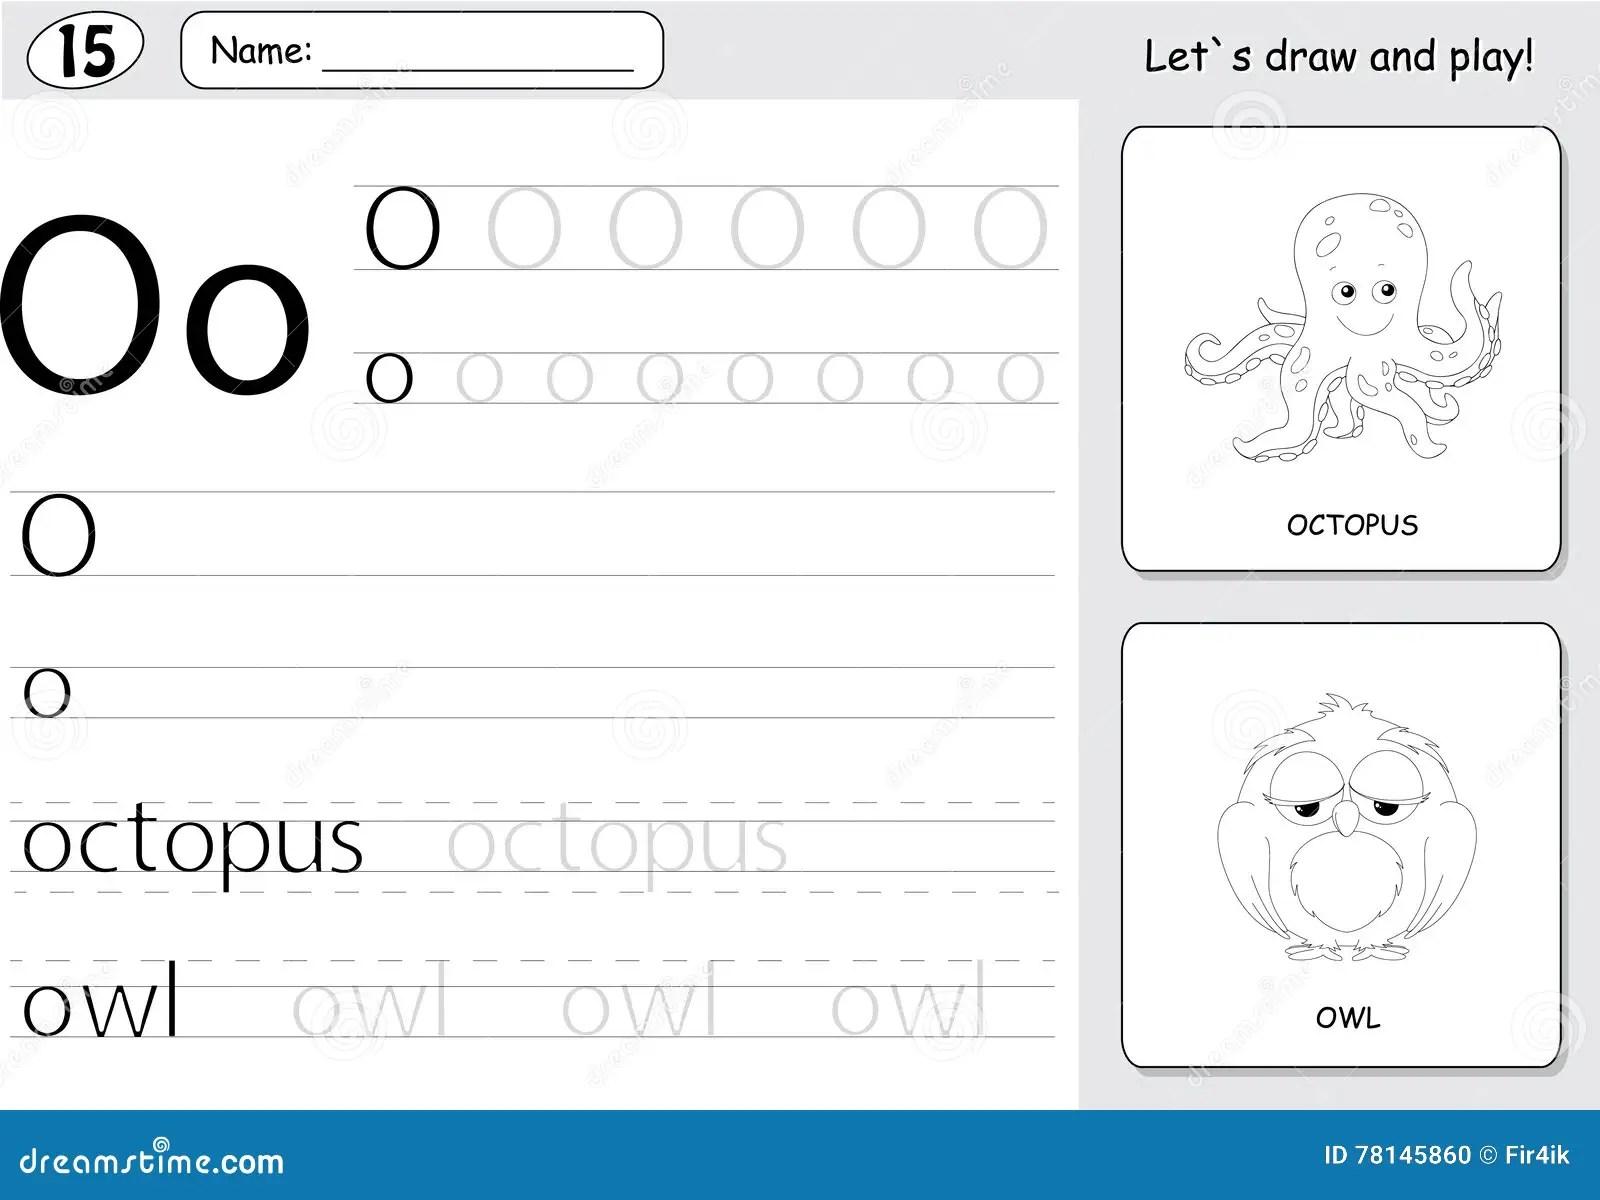 Cartoon Octopus And Owl Alphabet Tracing Worksheet